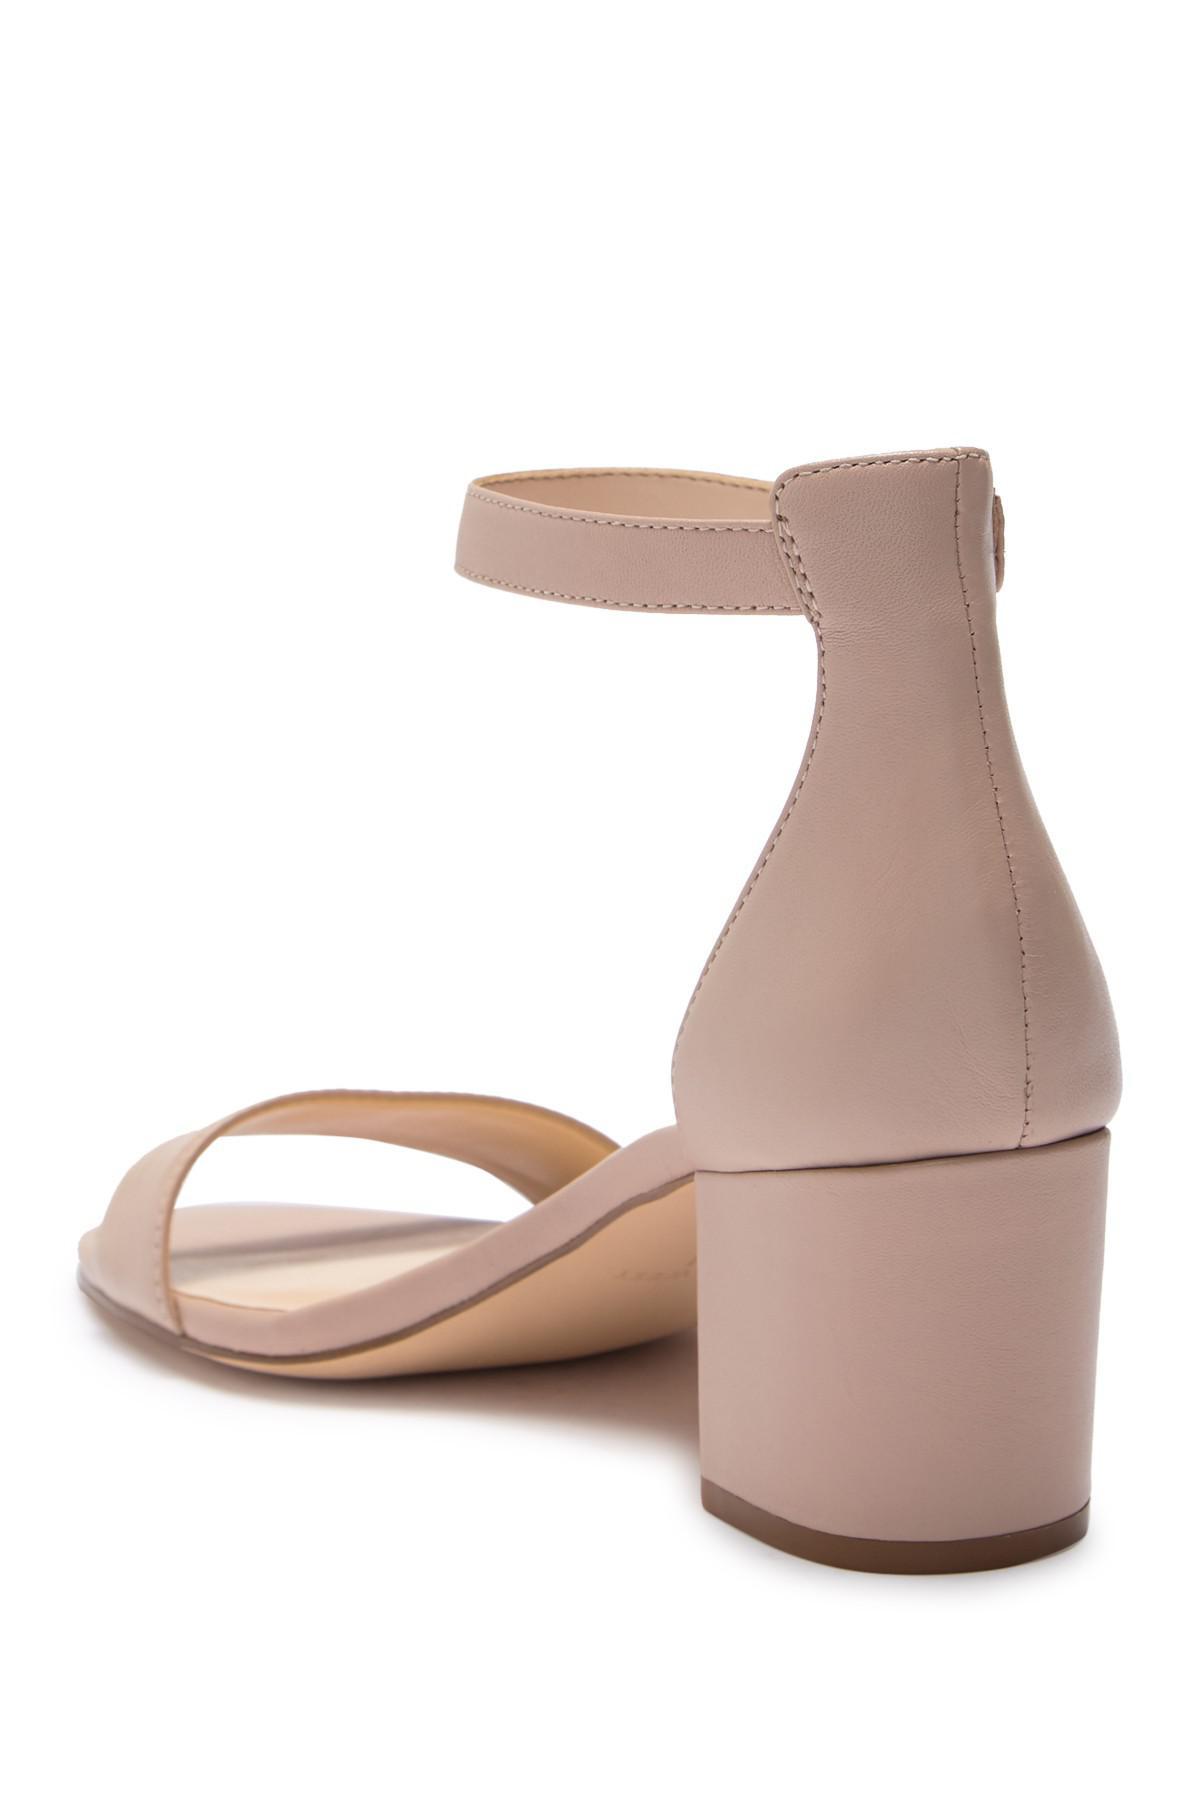 9a4edd997a3 Nine West - Natural Fields Ankle Strap Block Heel Sandal - Lyst. View  fullscreen